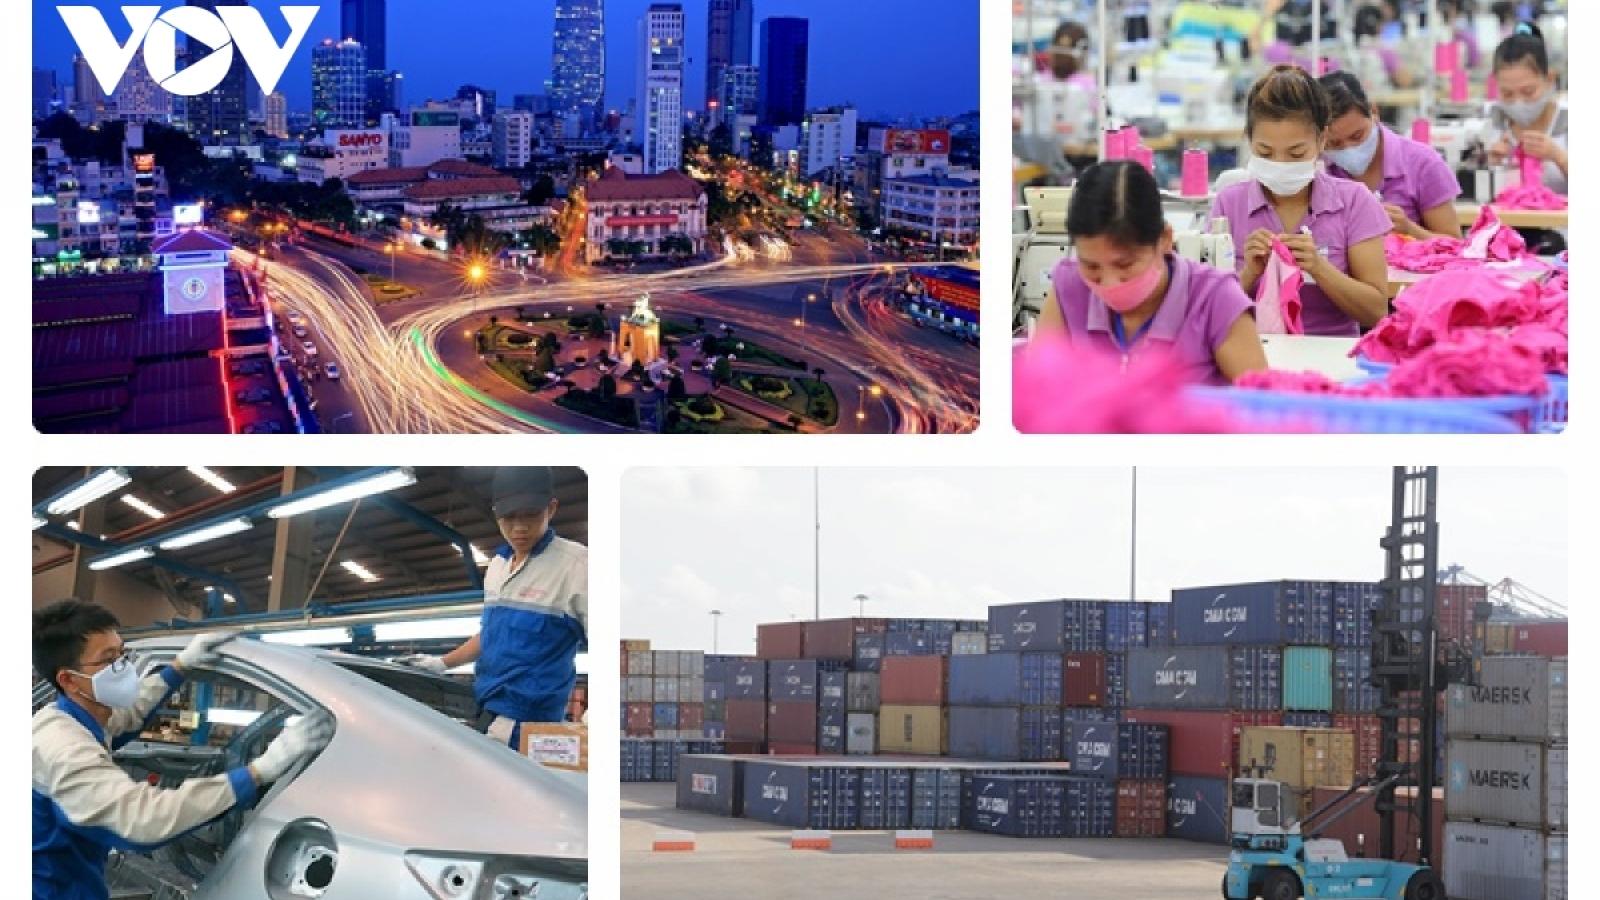 International media give optimistic assessment of Vietnamese economy